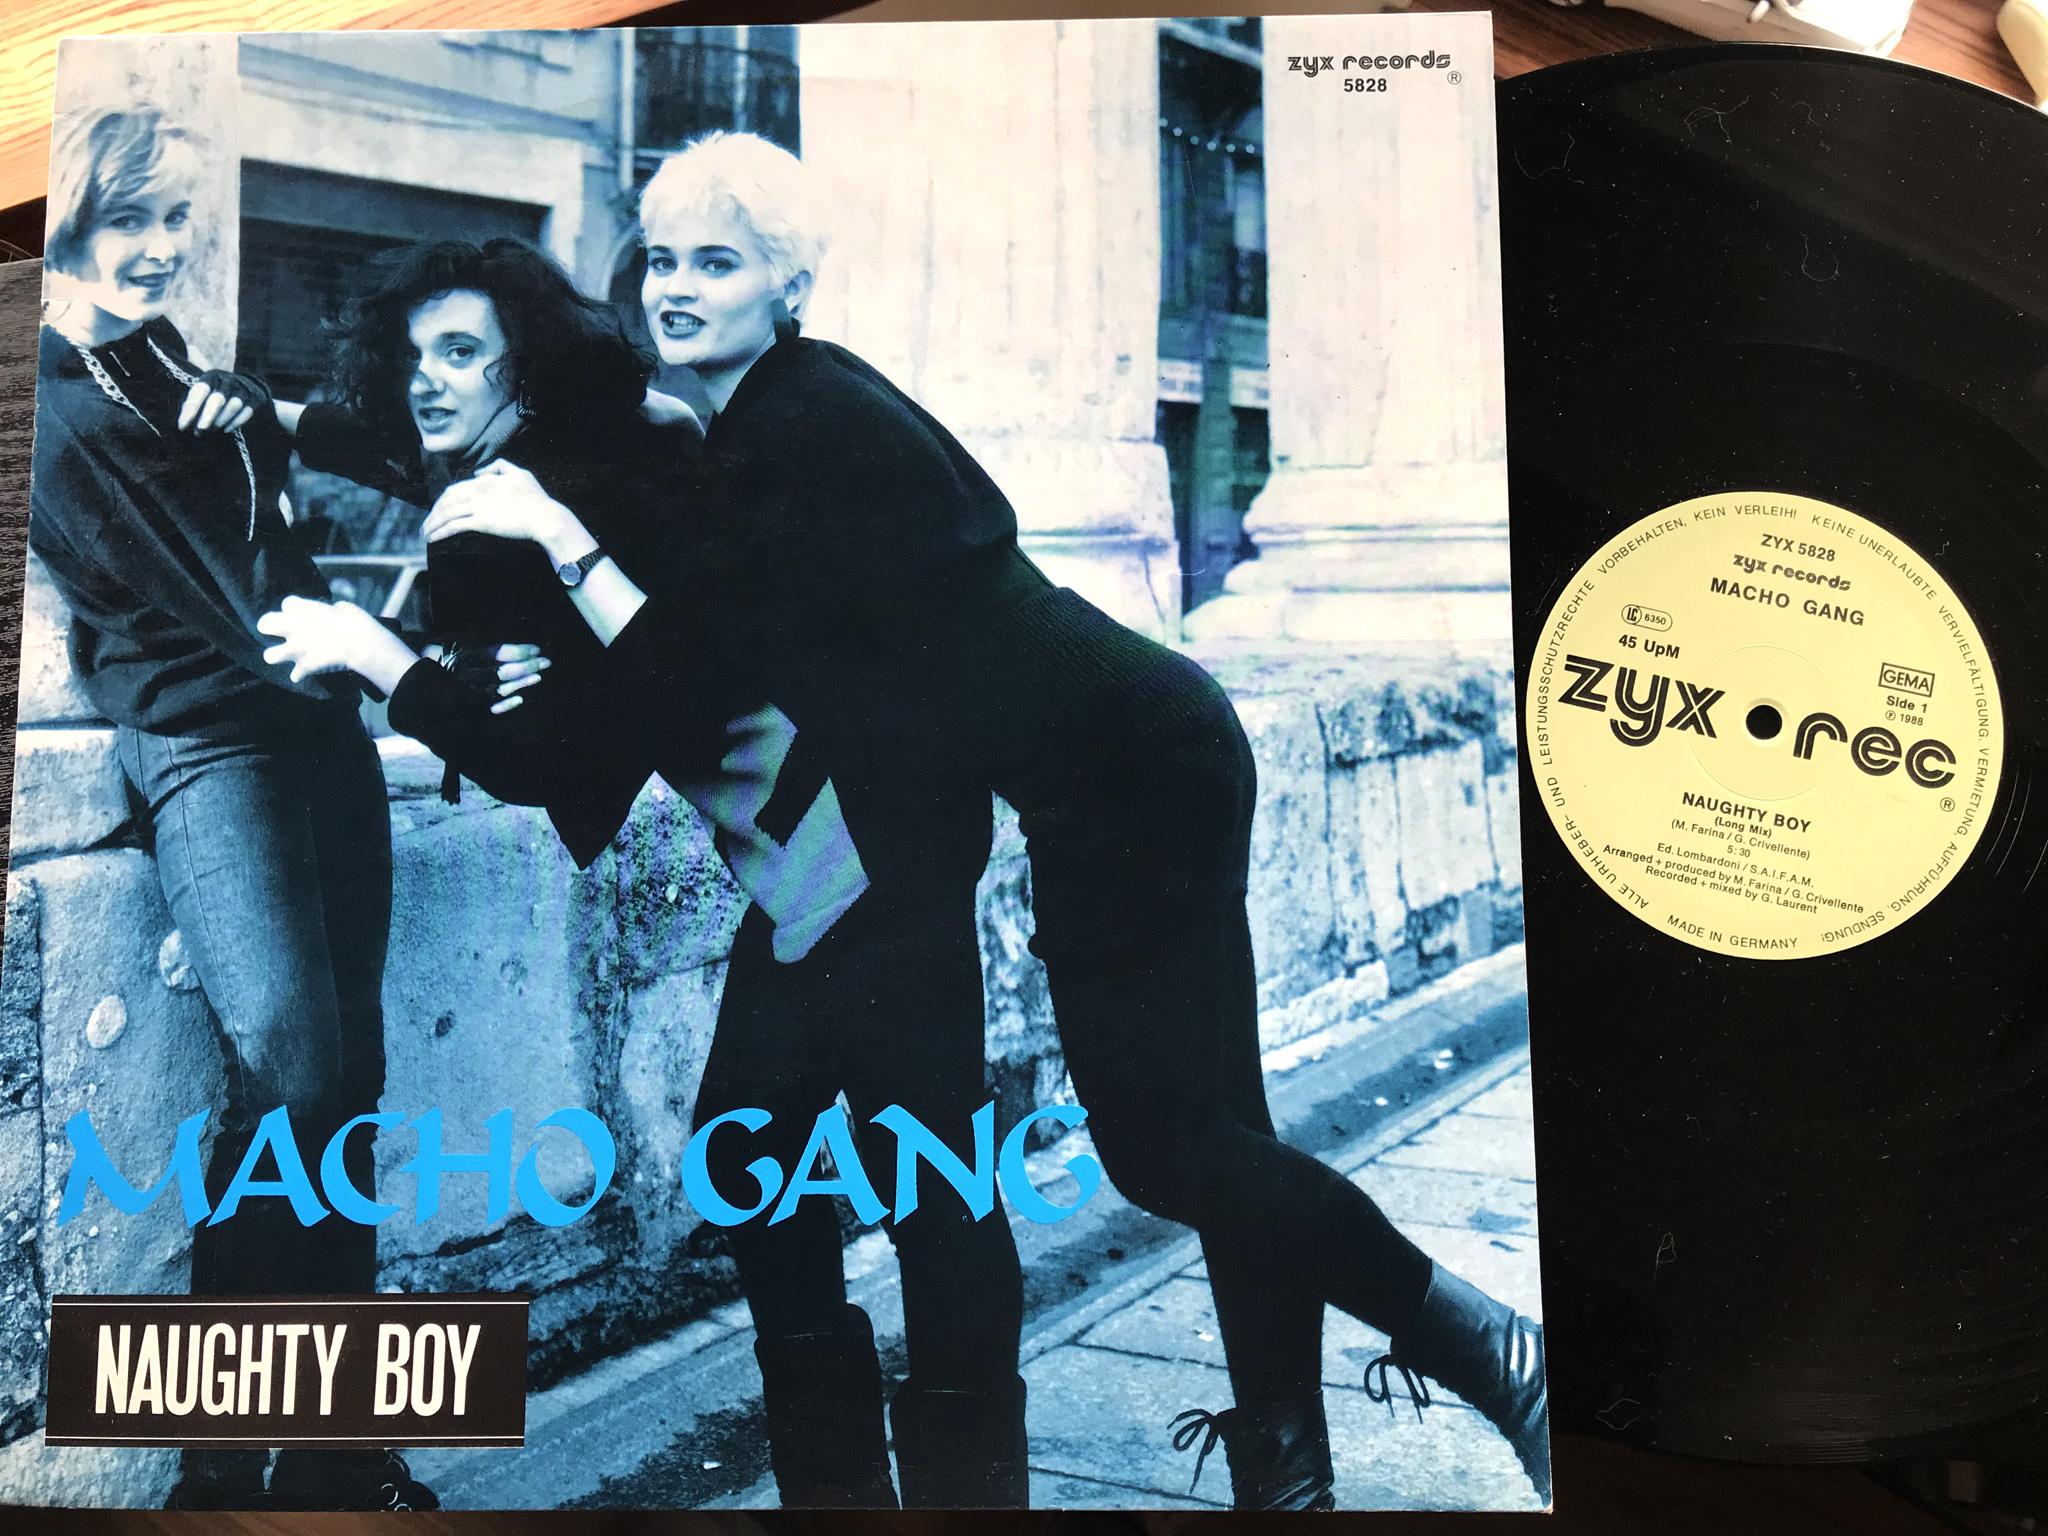 Macho Gang - Naughty Boy